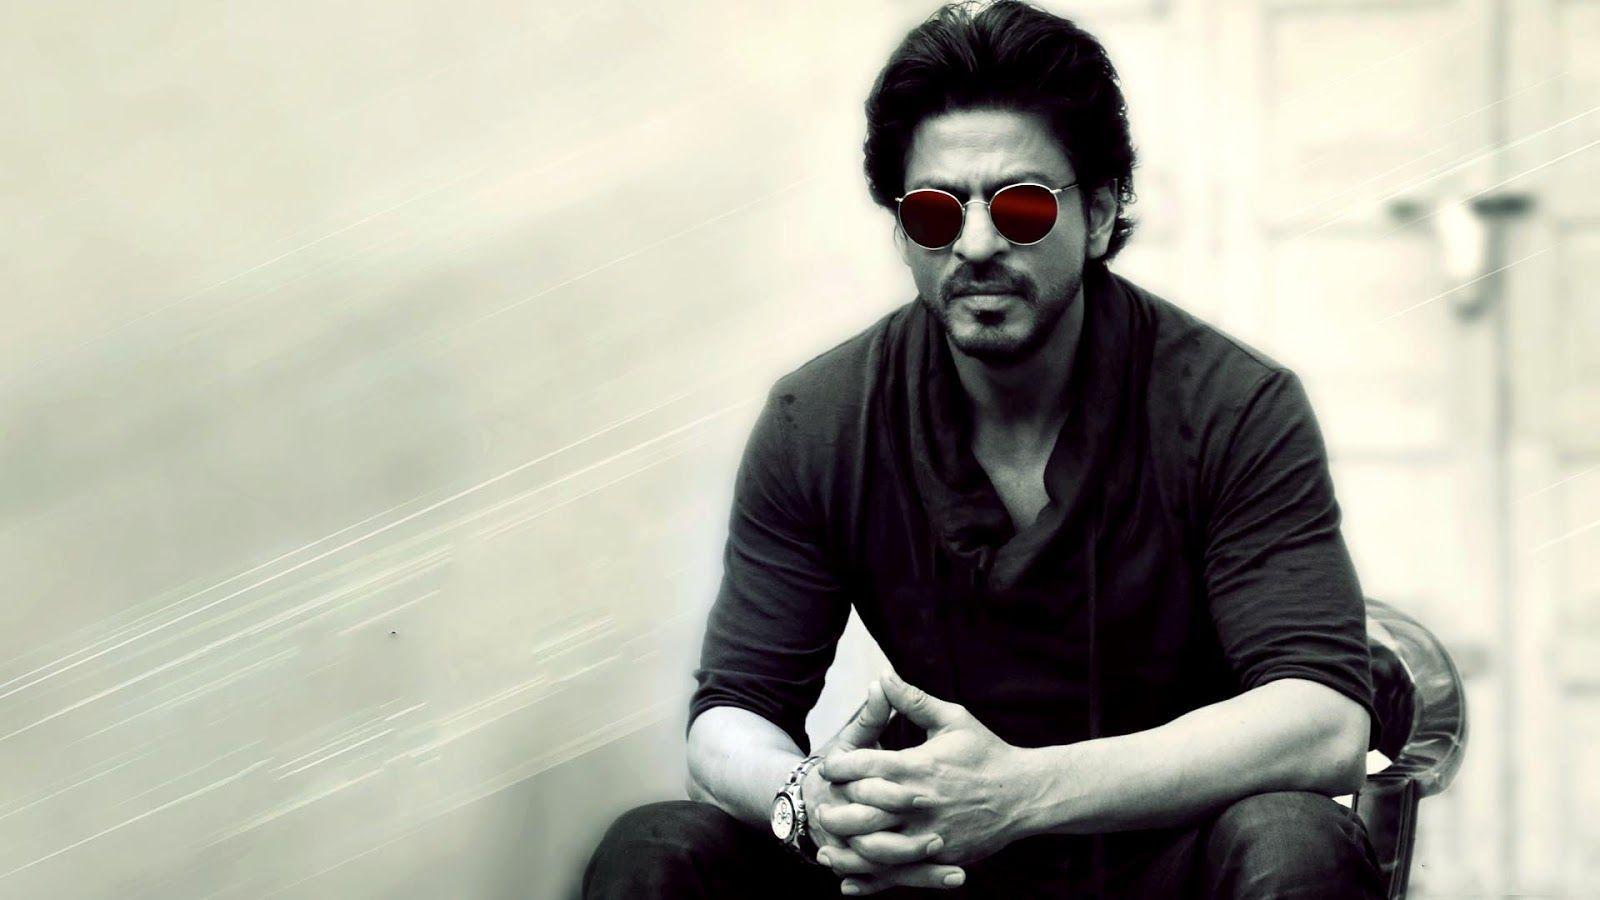 Shahrukh Khan Hd Wallpapers: Shah Rukh Khan Wallpapers